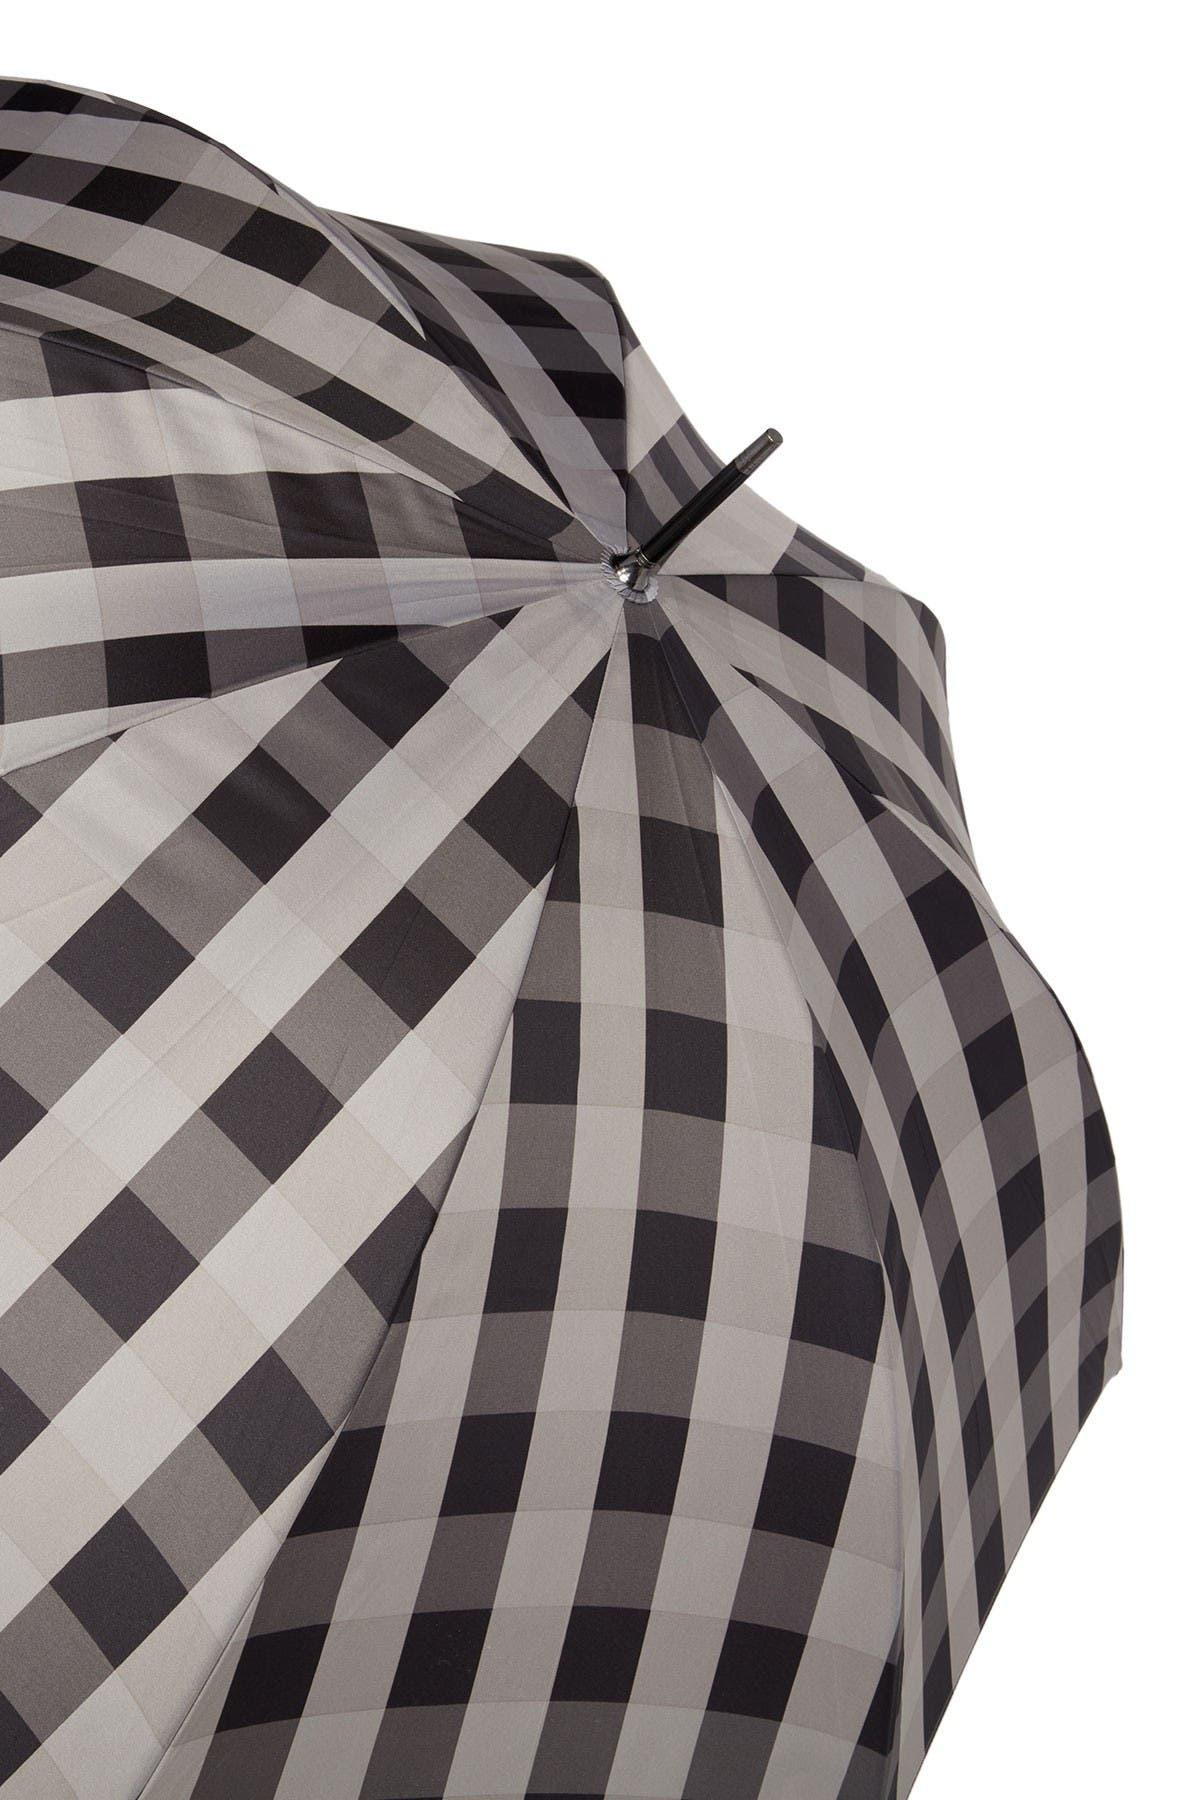 Image of Nordstrom Rack Harrel Stick Umbrella